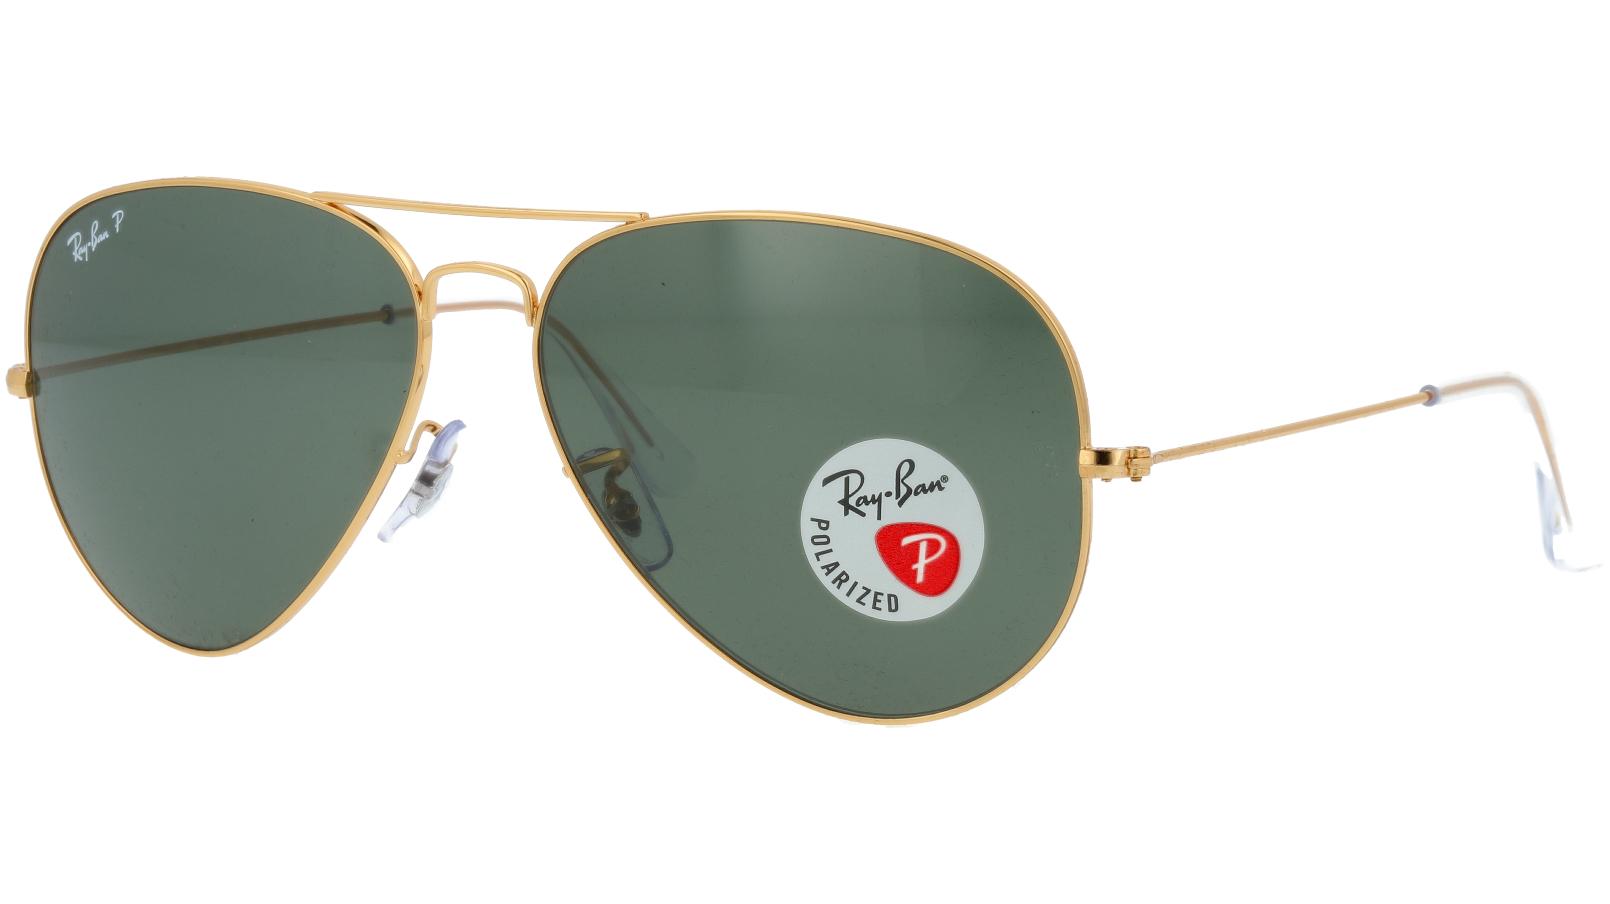 Ray-Ban RB3025 001/58 62 Arista Polarized Sunglasses